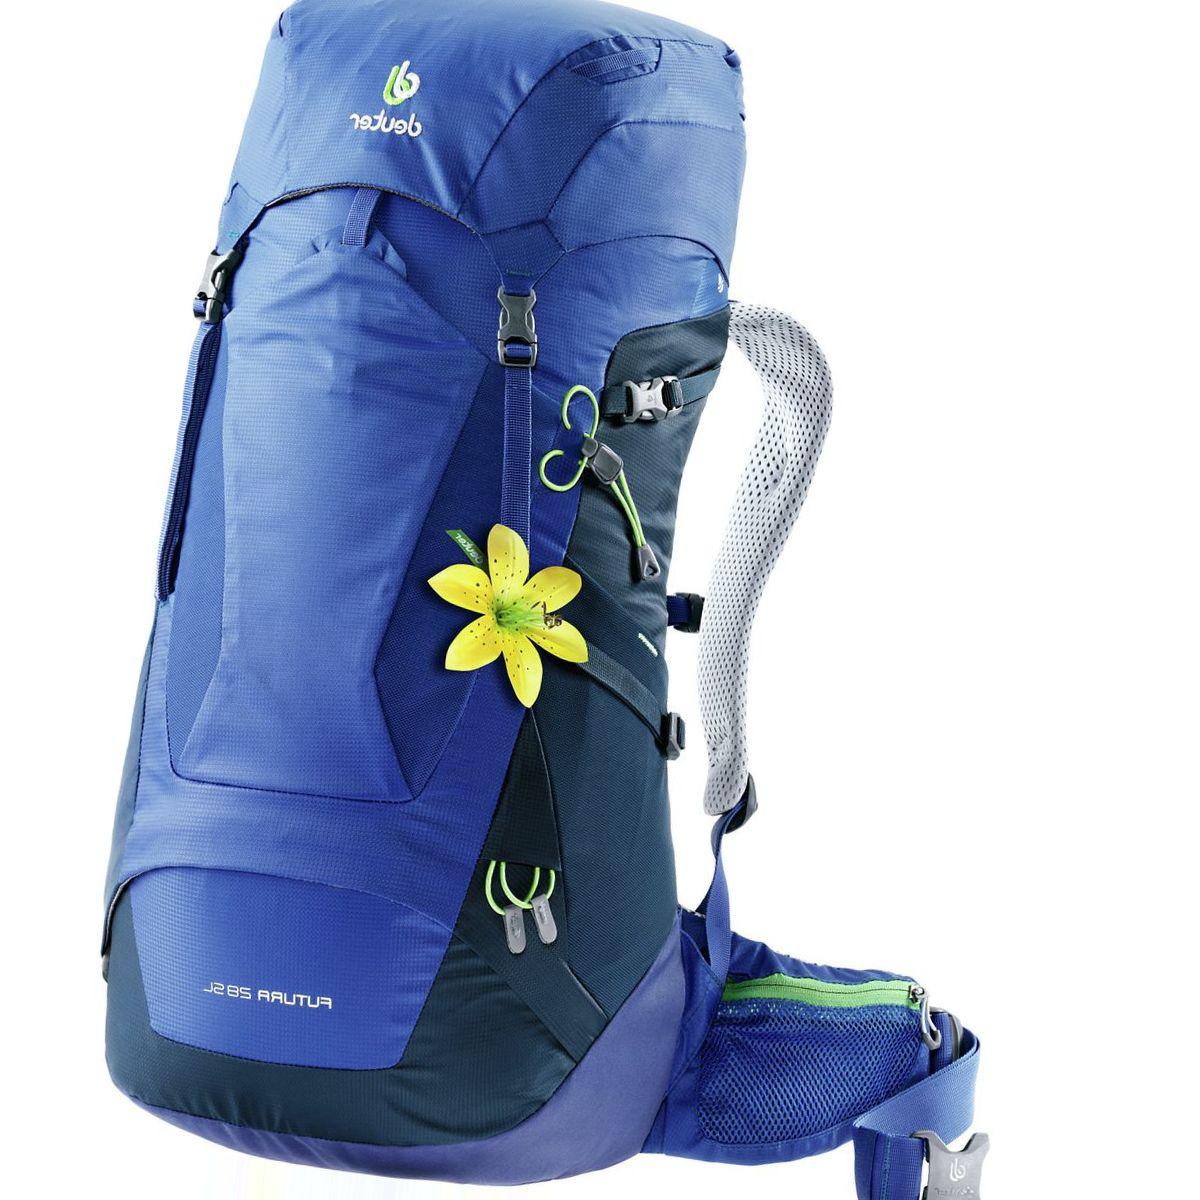 Deuter Futura SL 28L Backpack - Women's